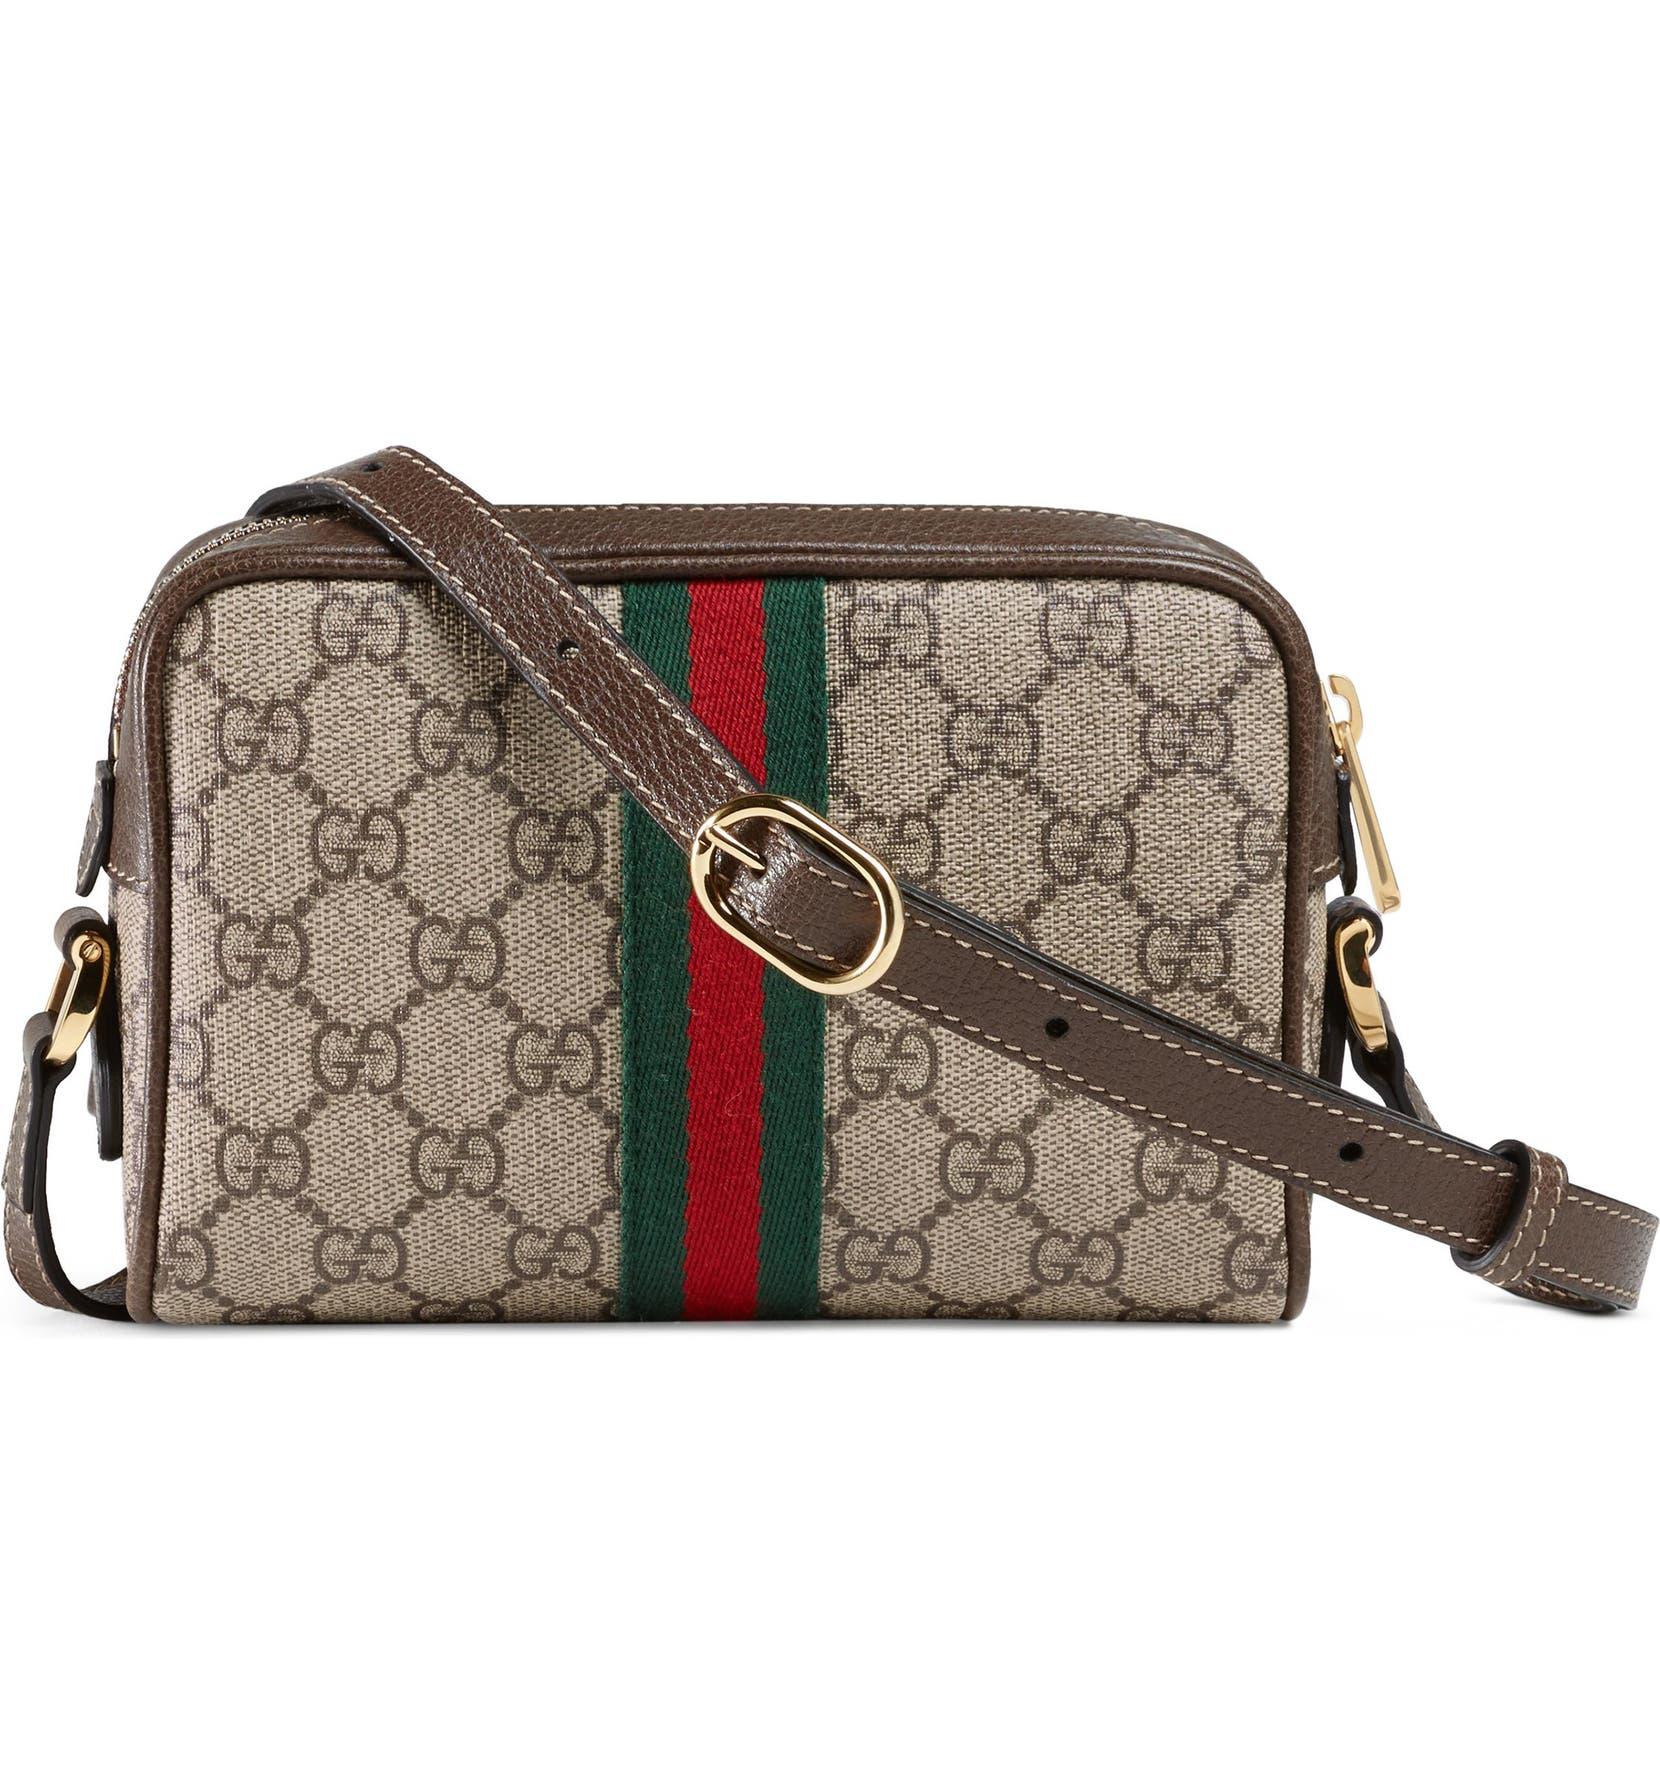 9baa8ffe61 Gucci Ophidia Small GG Supreme Canvas Crossbody Bag